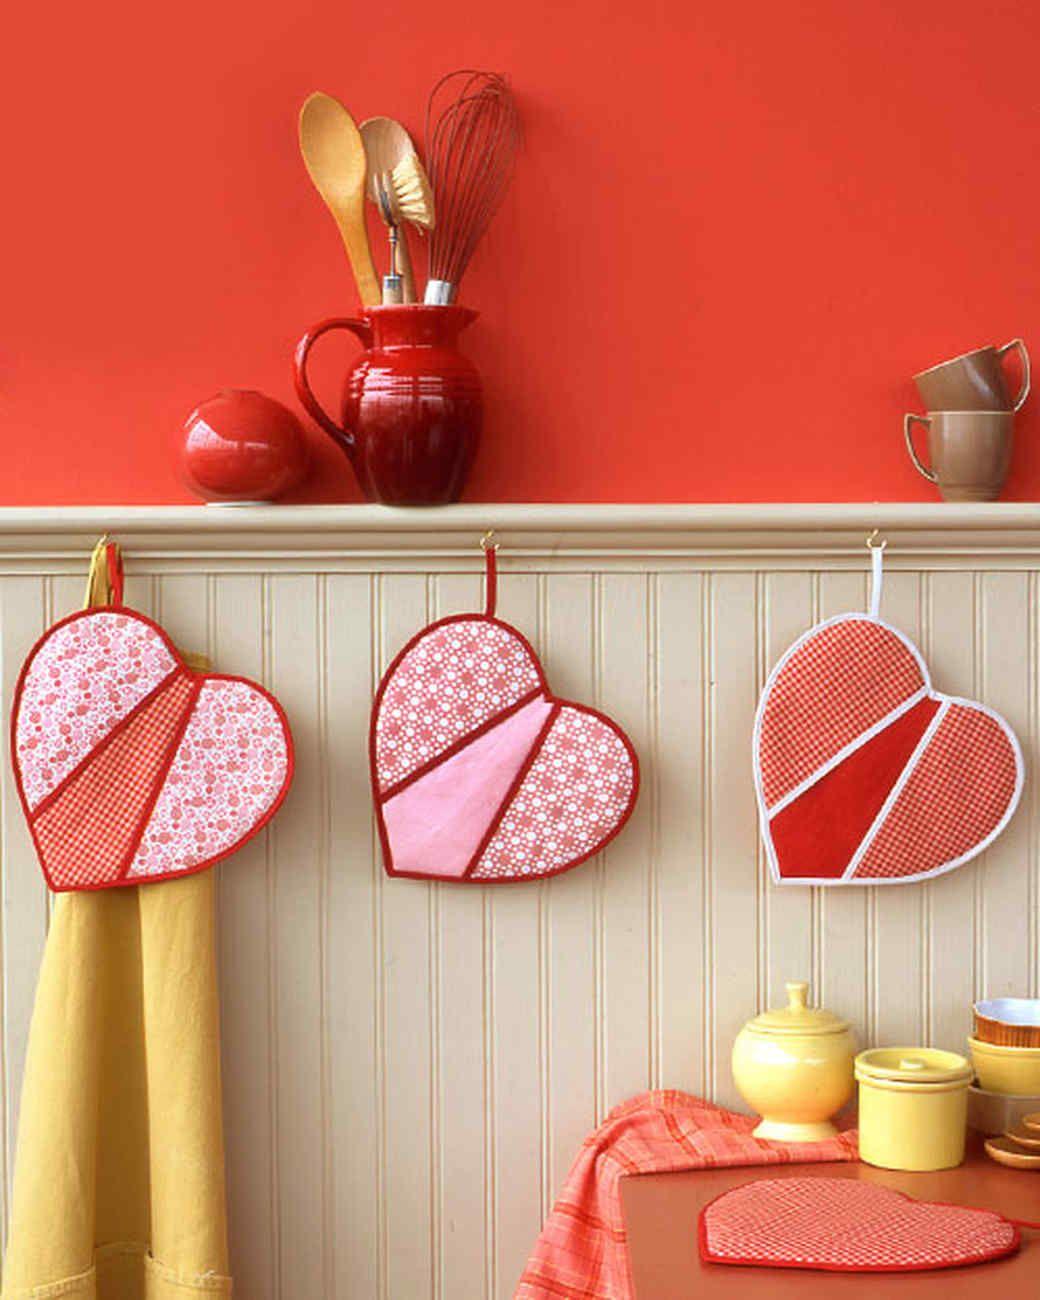 Heart-Shaped Pot Holders | Martha stewart, Heart shapes and Craft